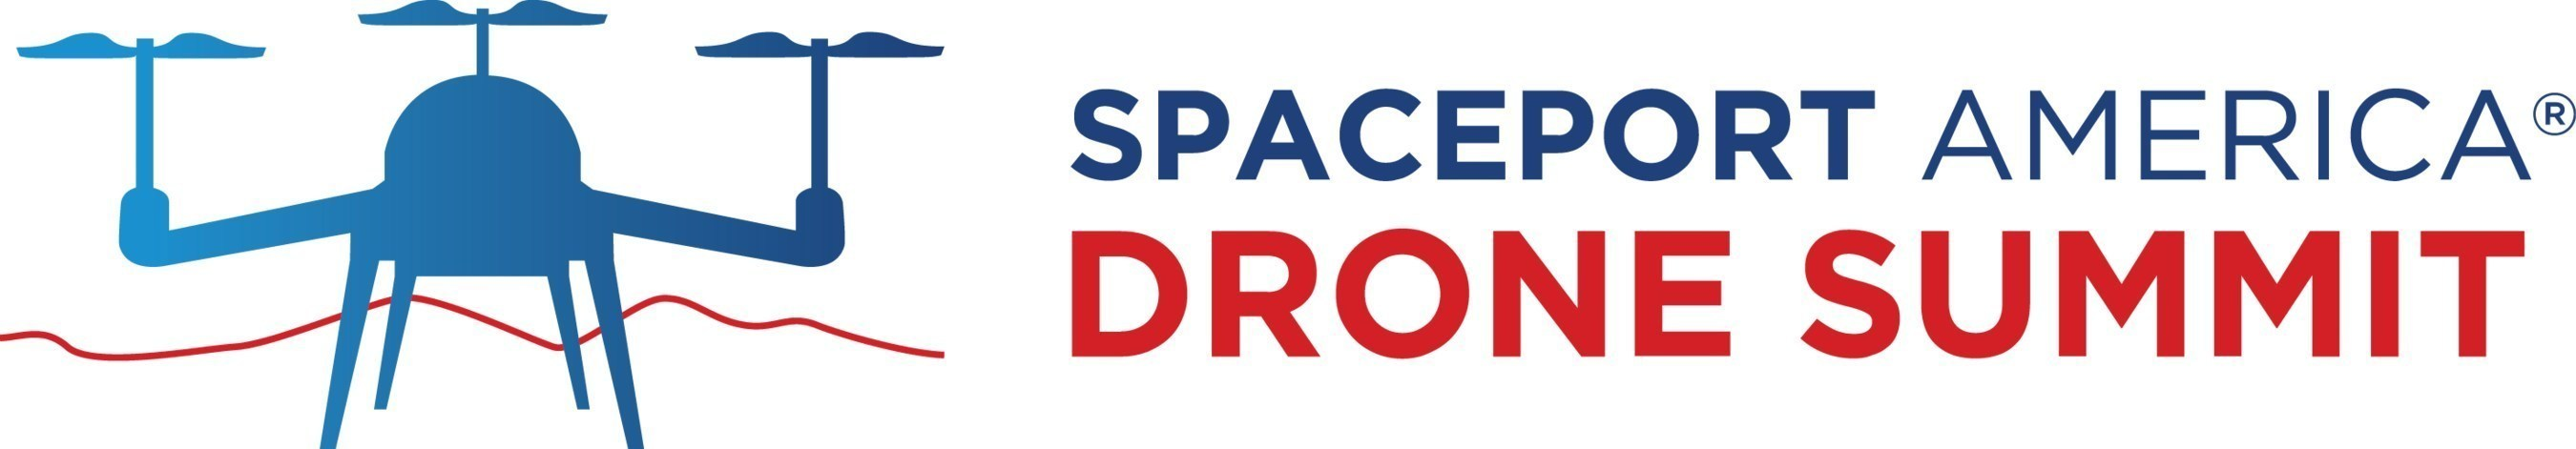 Spaceport_America_Drone_Summit_Logo